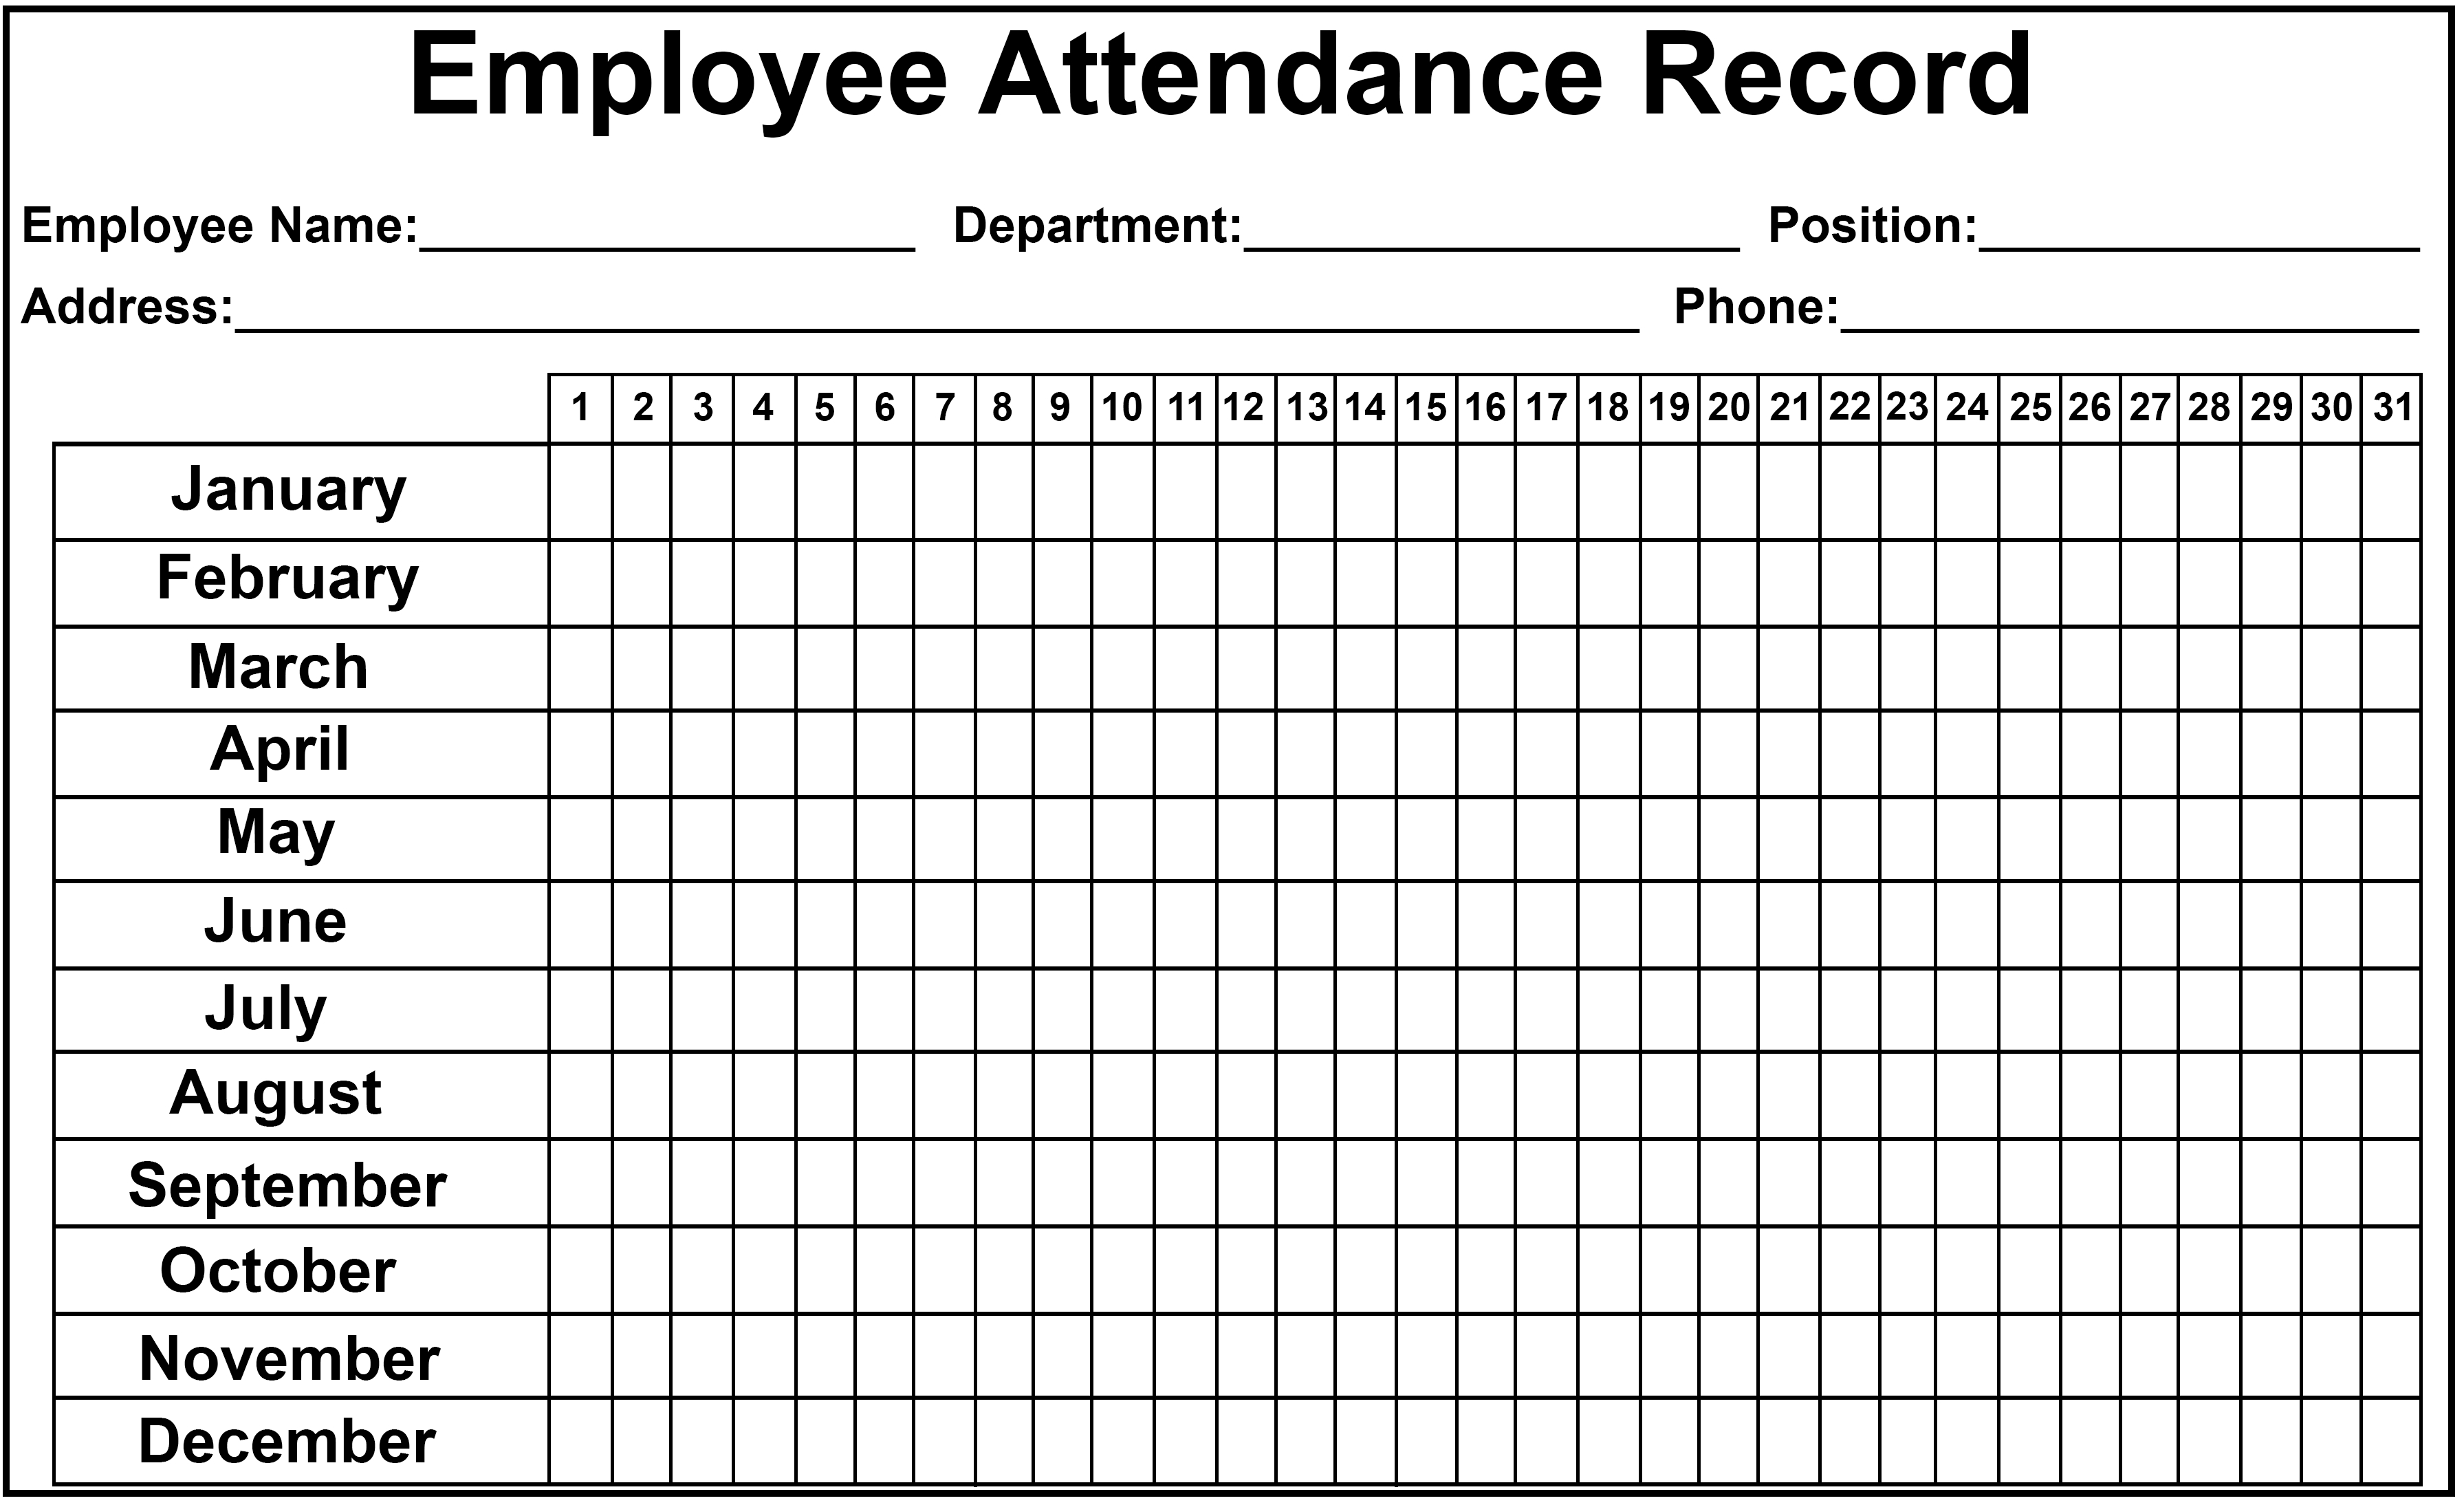 Employee Attendance Tracker Sheet 2019 | Printable Calendar Diy with regard to Free Printable Employee Attendance Calendar Template